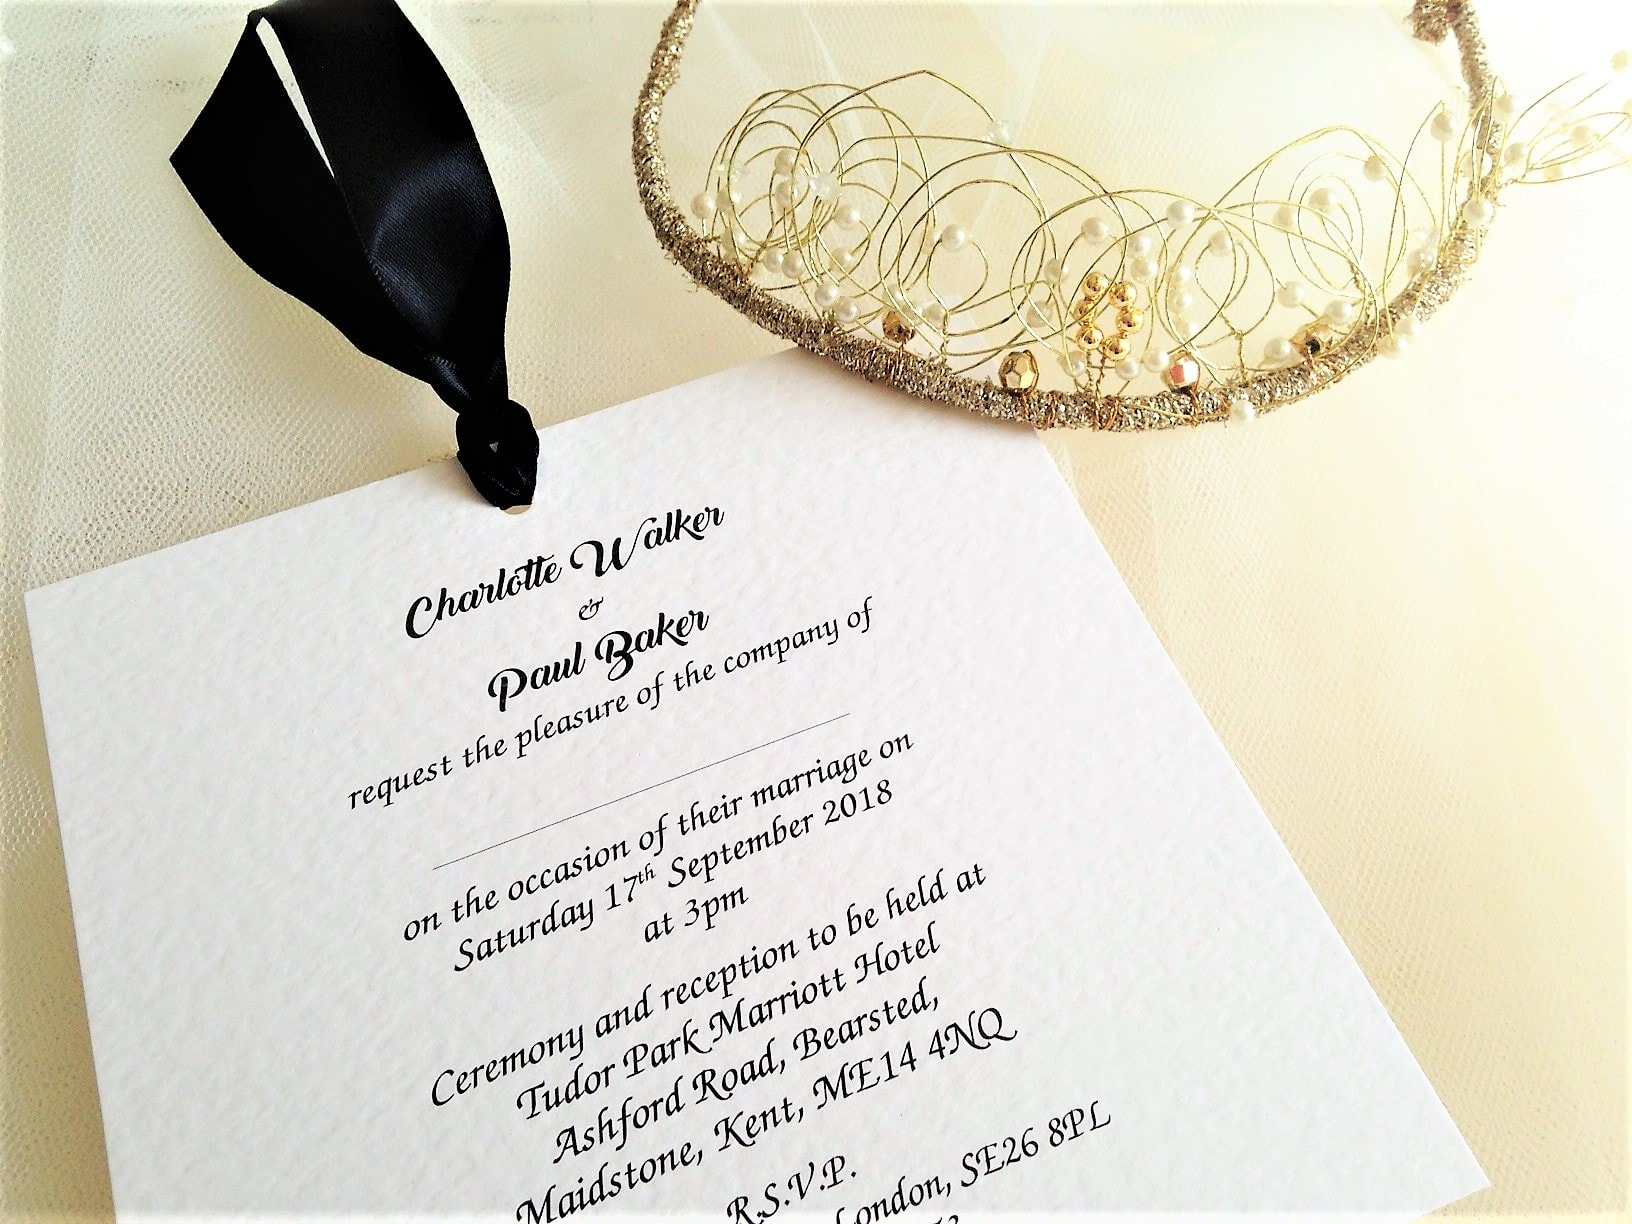 Bargain Wedding Invitations: Cheap Wedding Invitations From